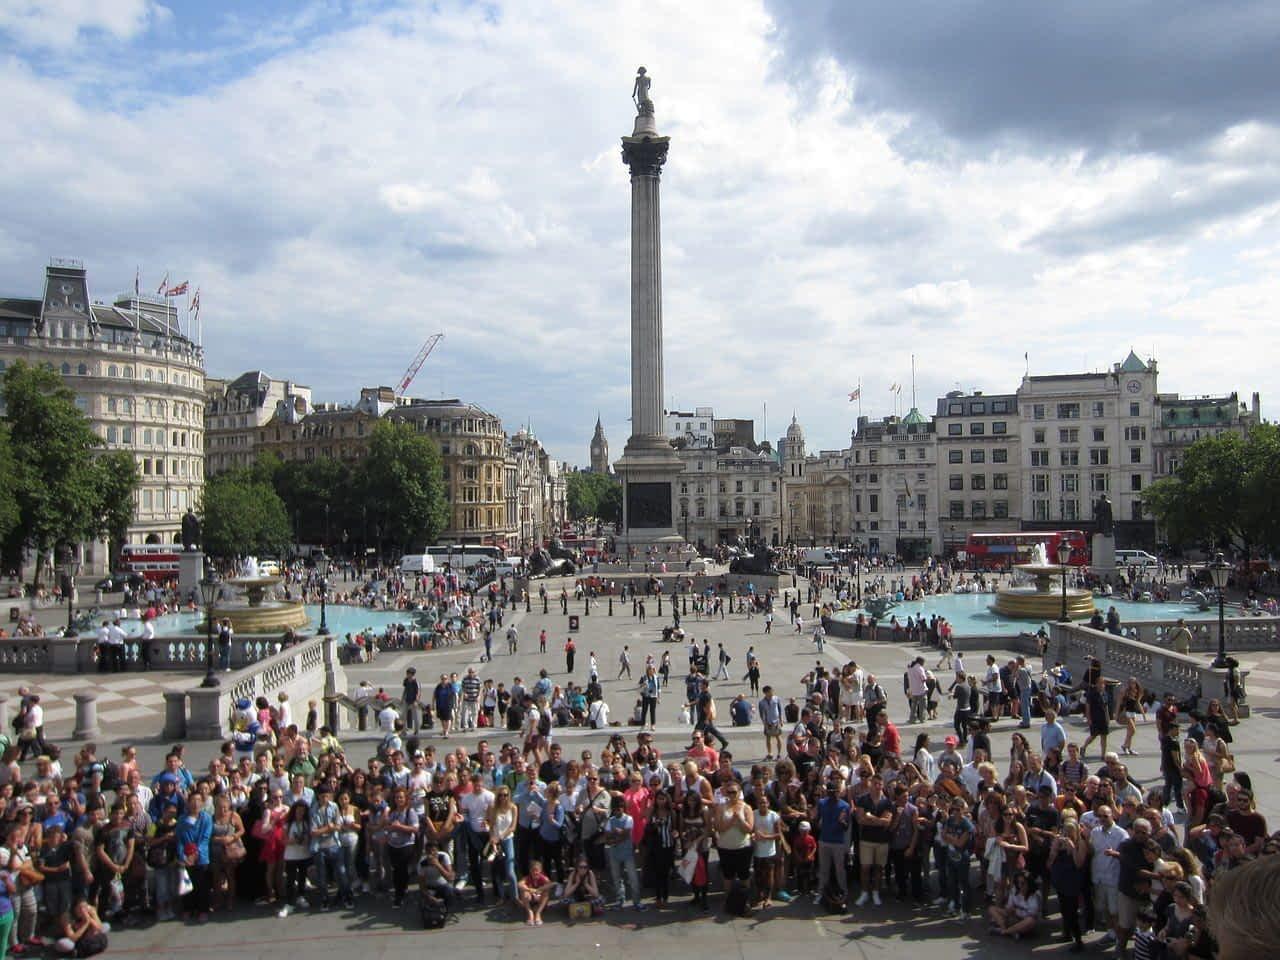 group photo Trafalgar Square